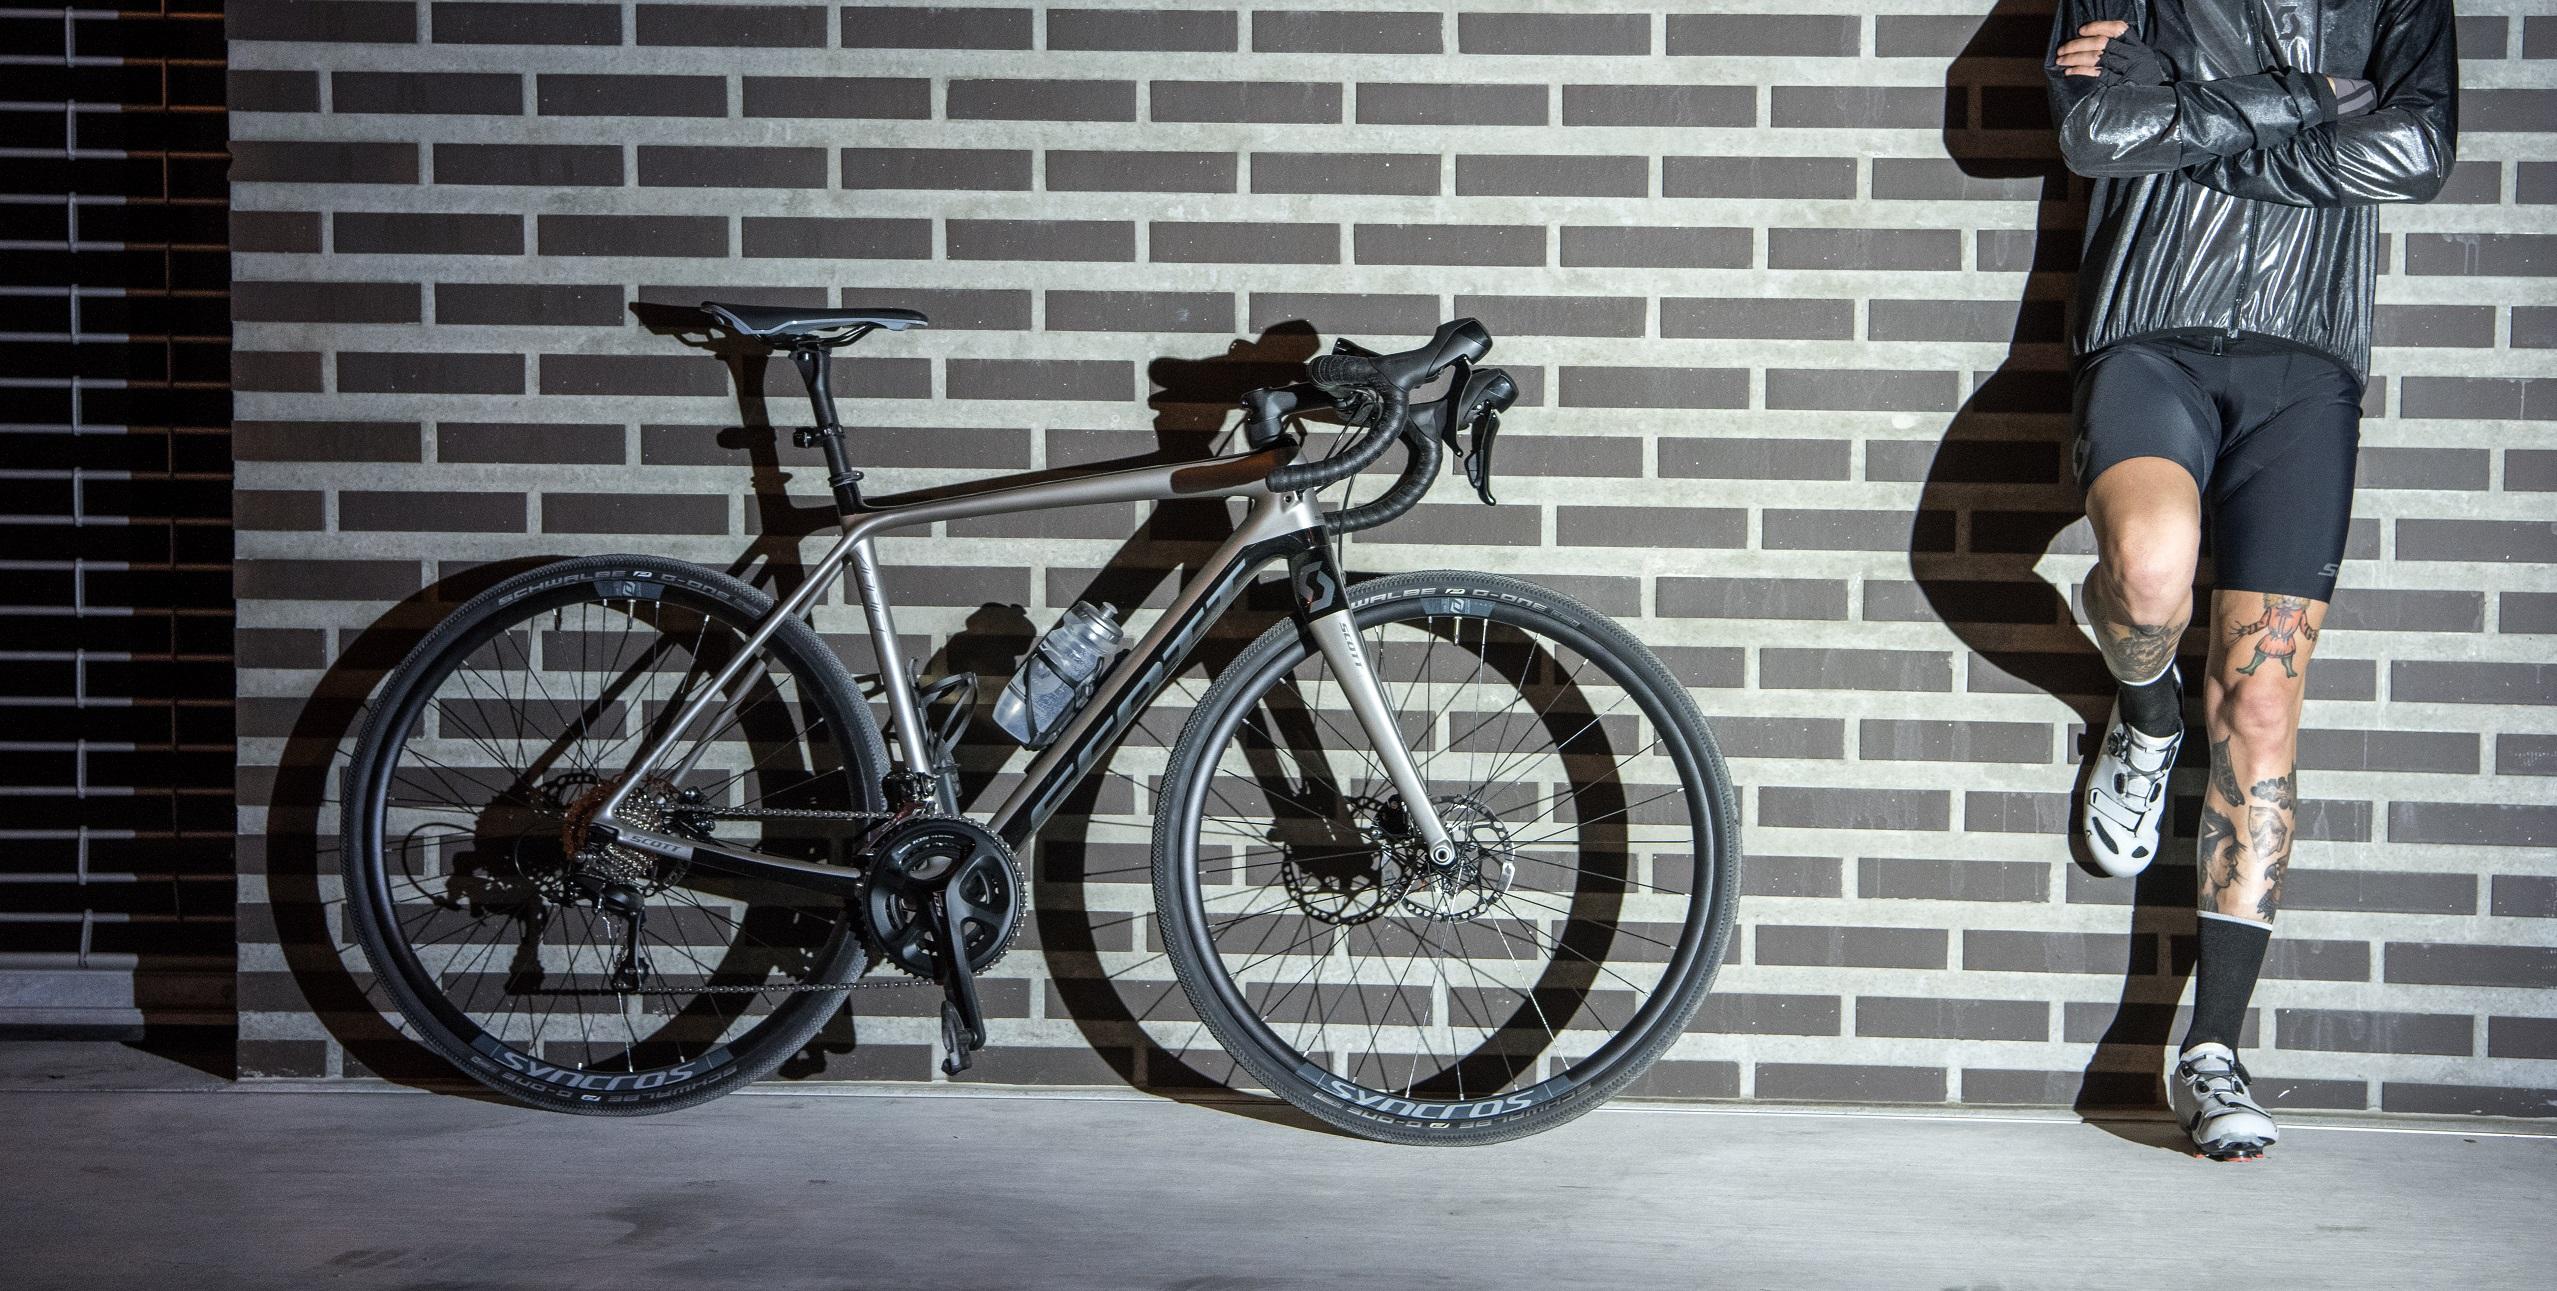 damen indoor cycling schuhe schuhe bodenfrost bikes. Black Bedroom Furniture Sets. Home Design Ideas